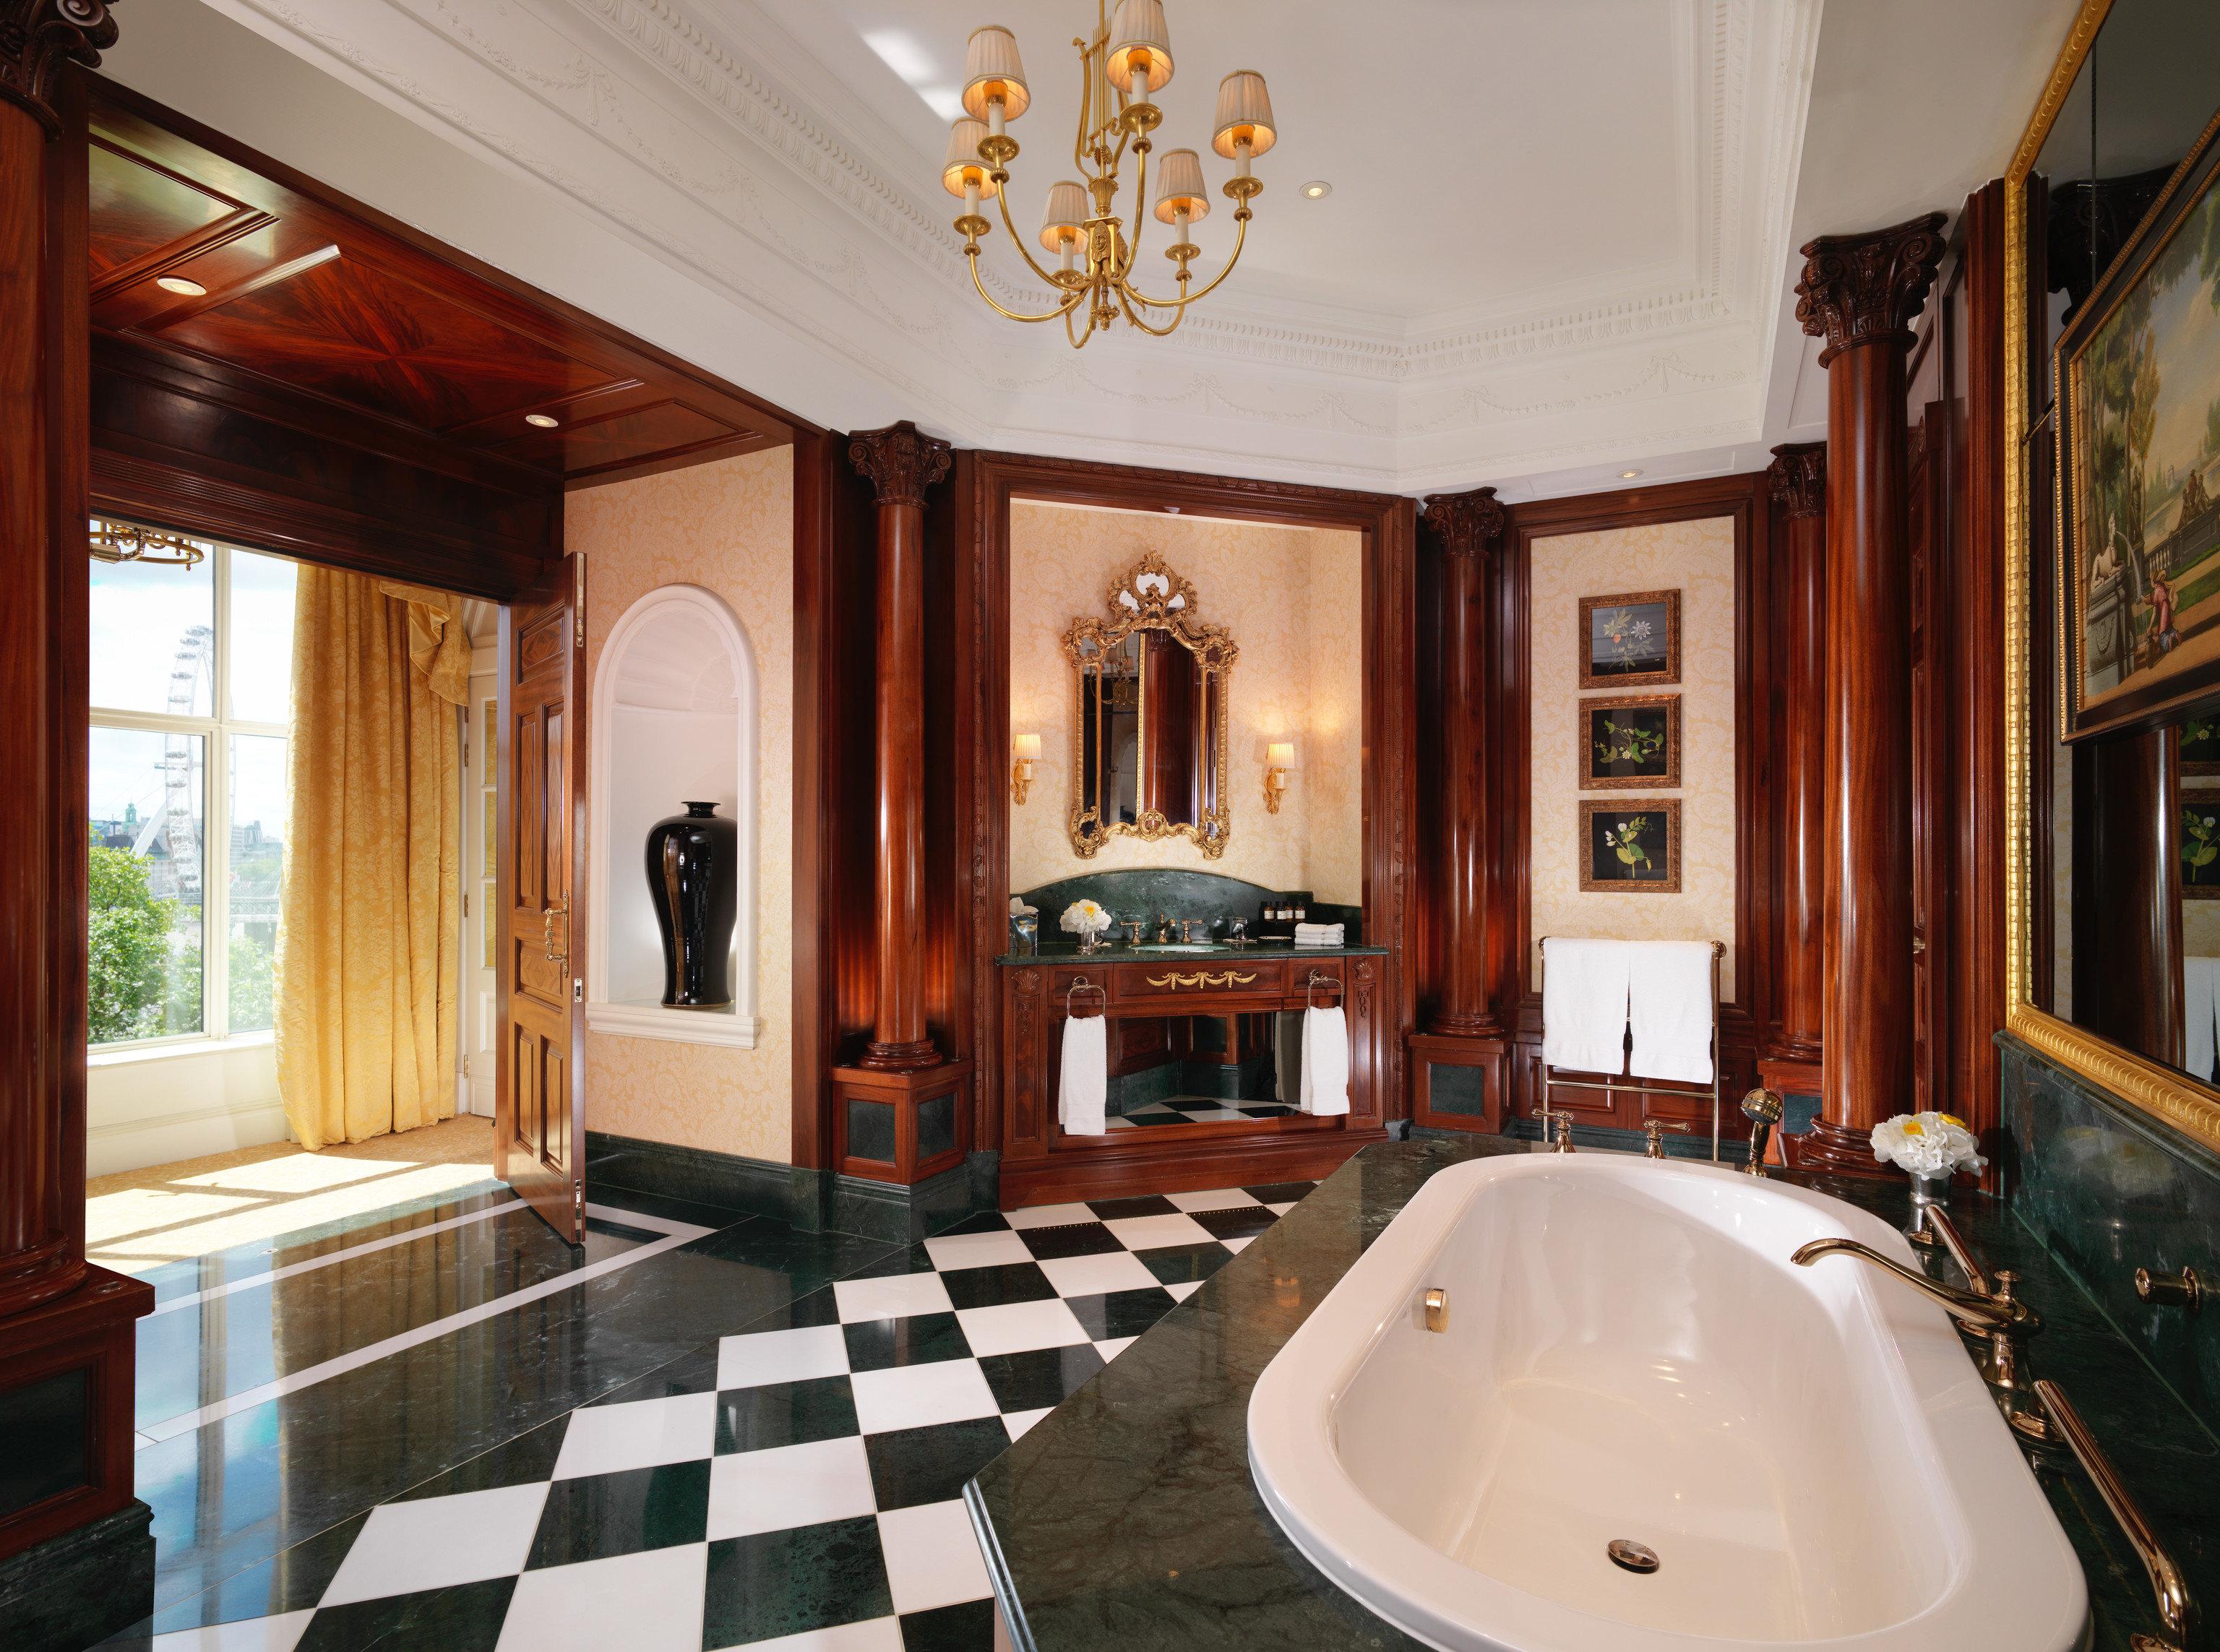 Hotels London Luxury Travel indoor bathroom window room property ceiling estate interior design sink real estate Suite flooring tub tile bathtub Bath tiled